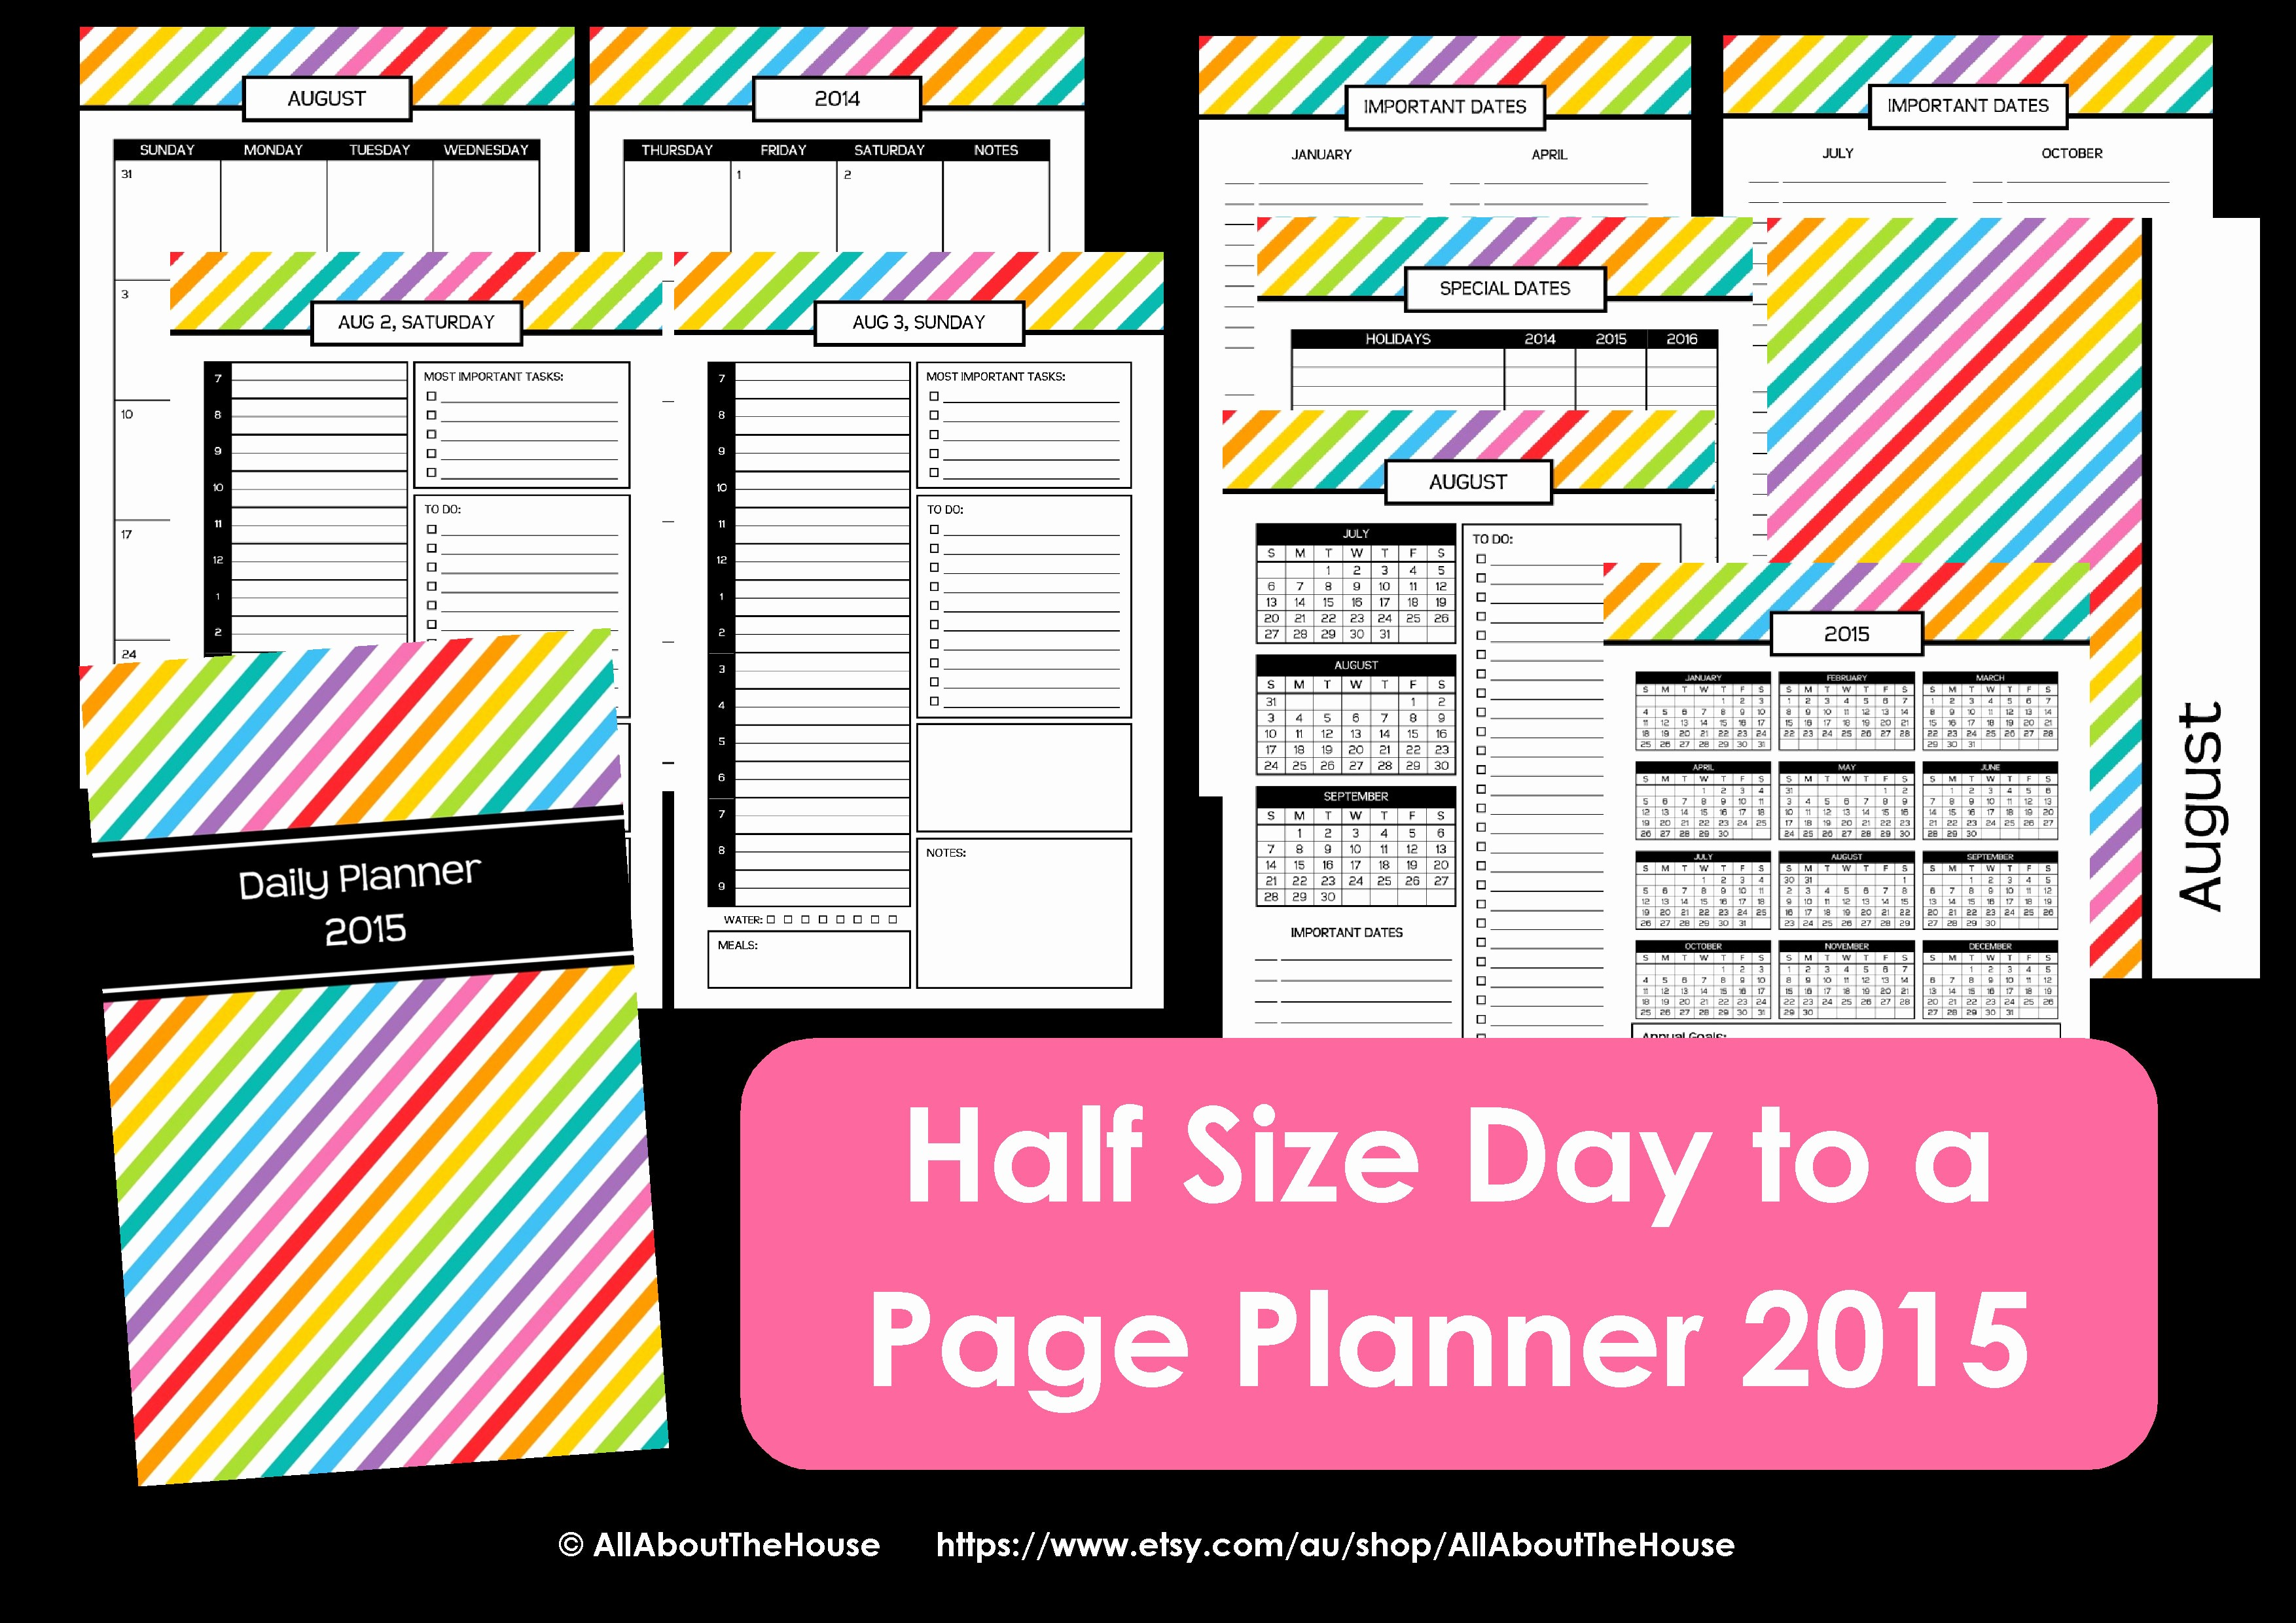 Free Printable Daily Calendar 2015 Elegant New Half Size Printable Planners for 2015